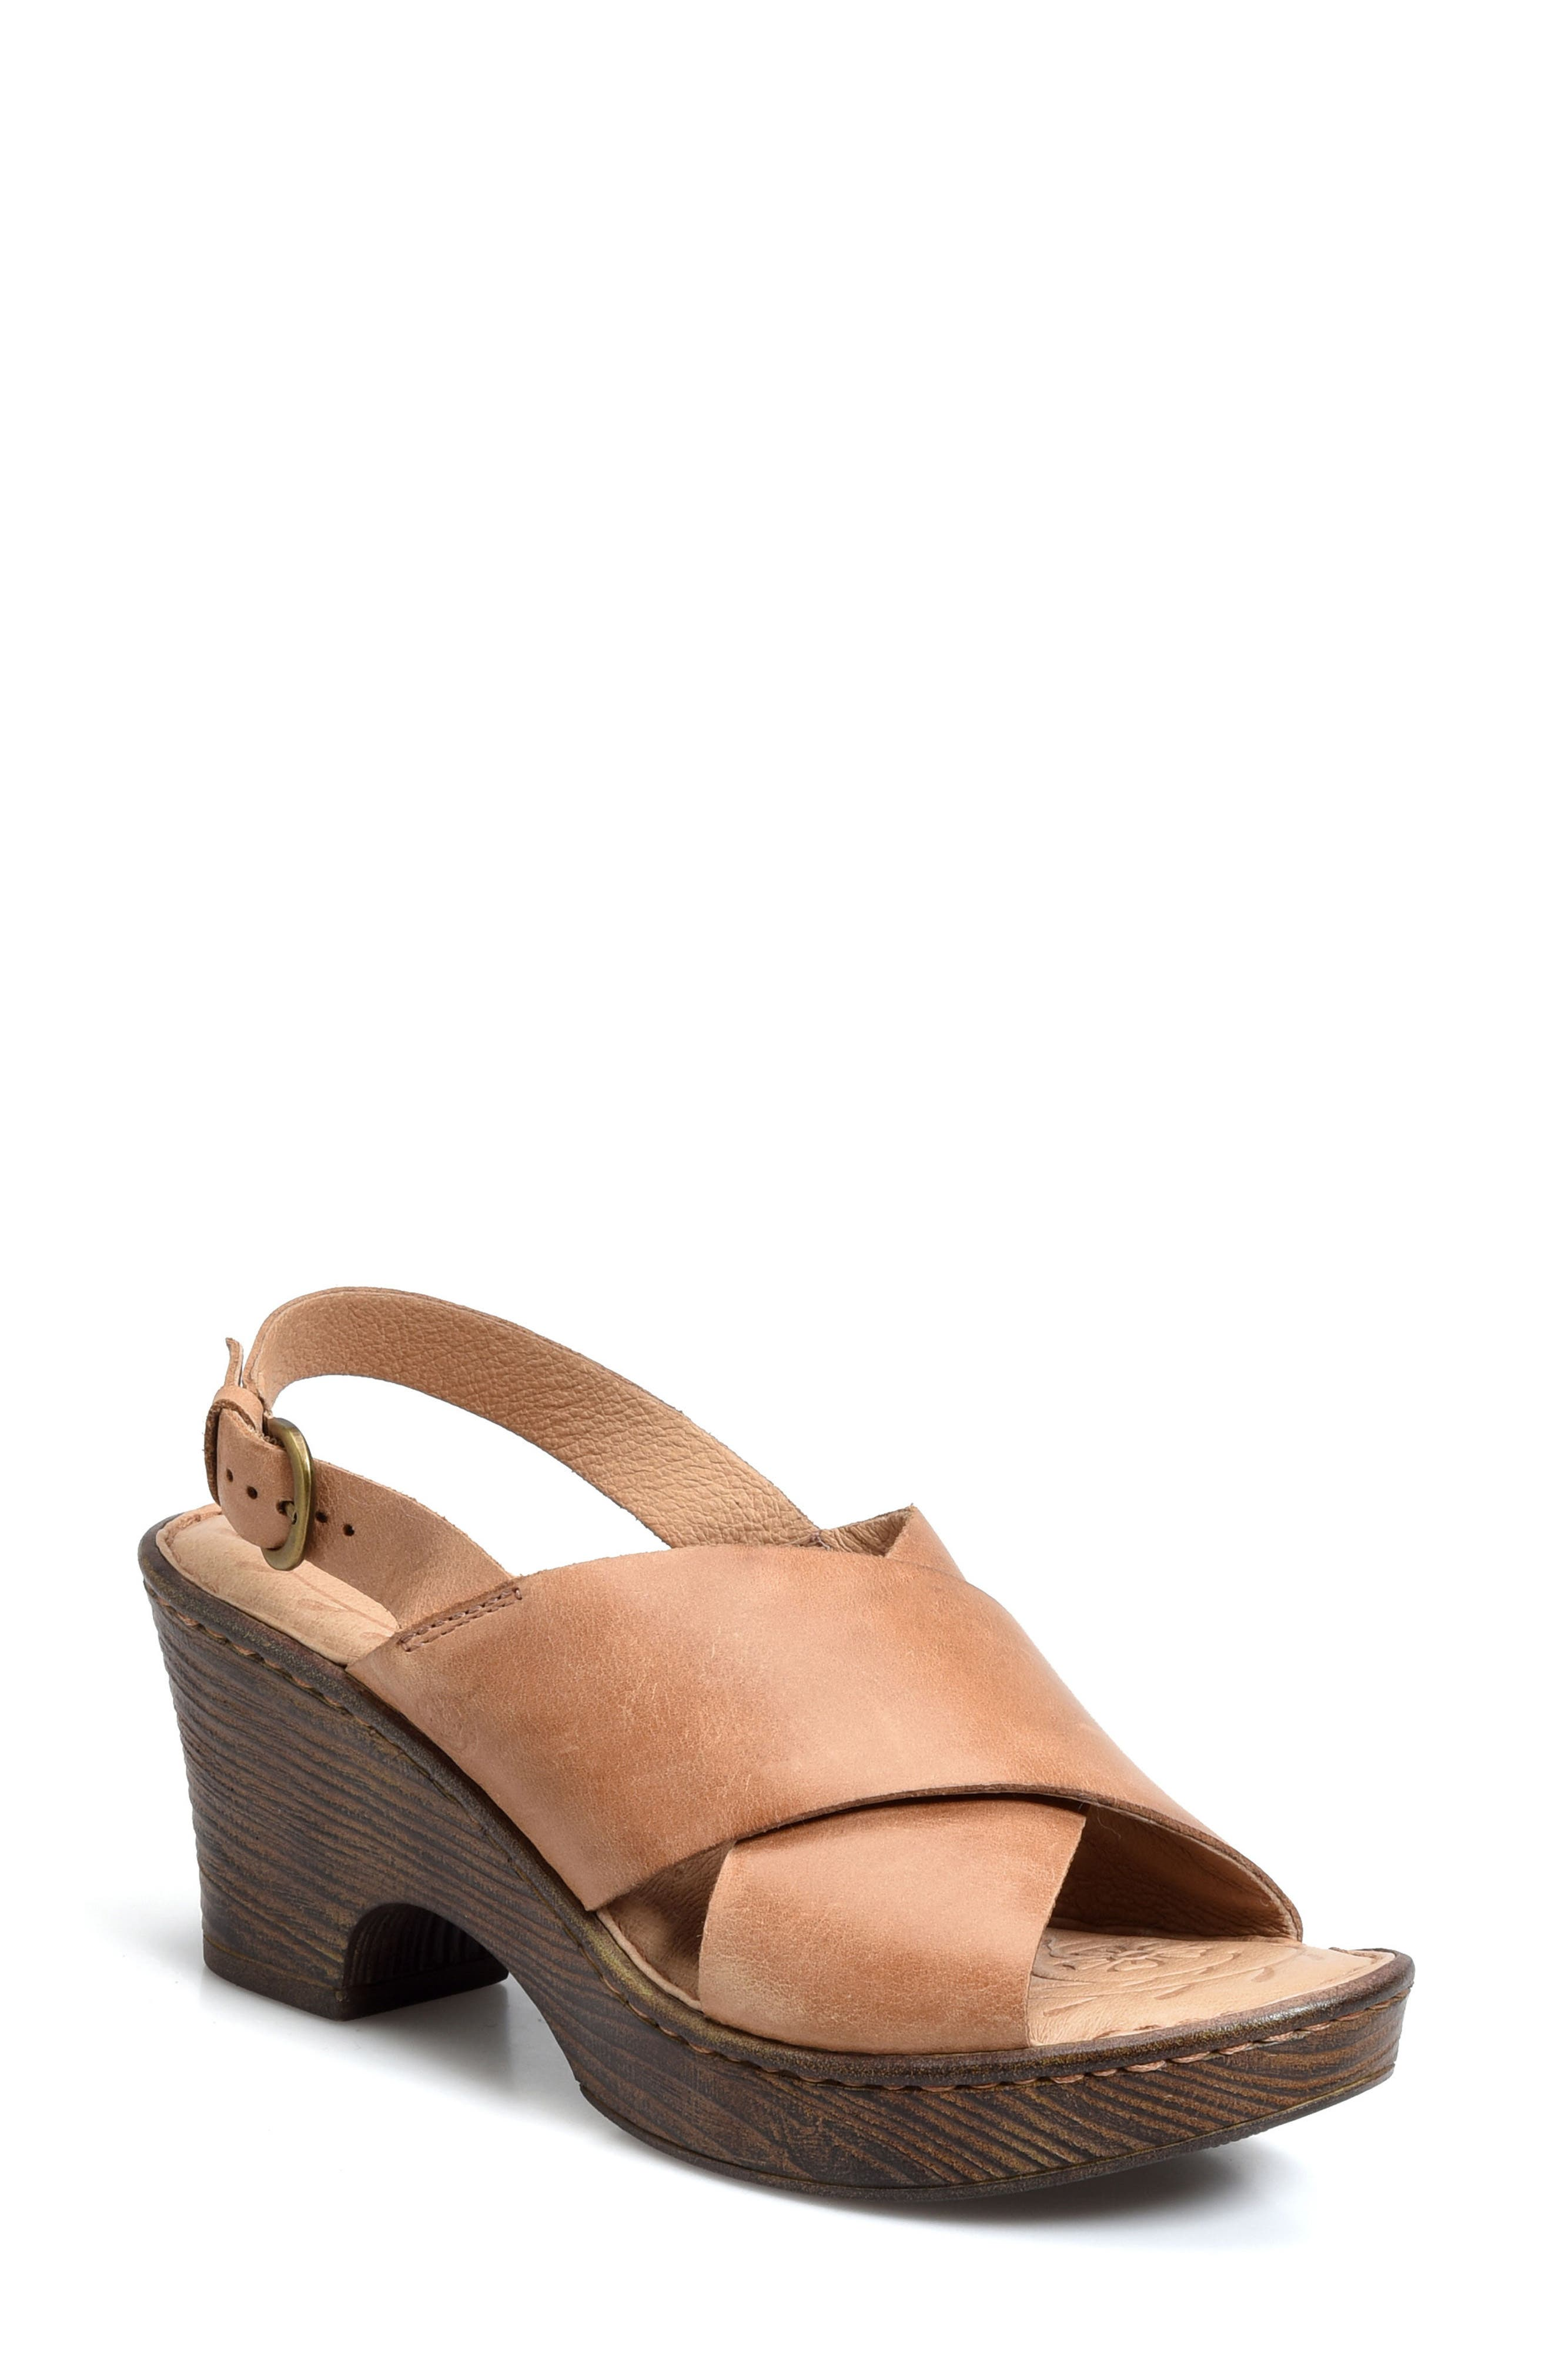 Børn Coralyn Platform Sandal (Women)